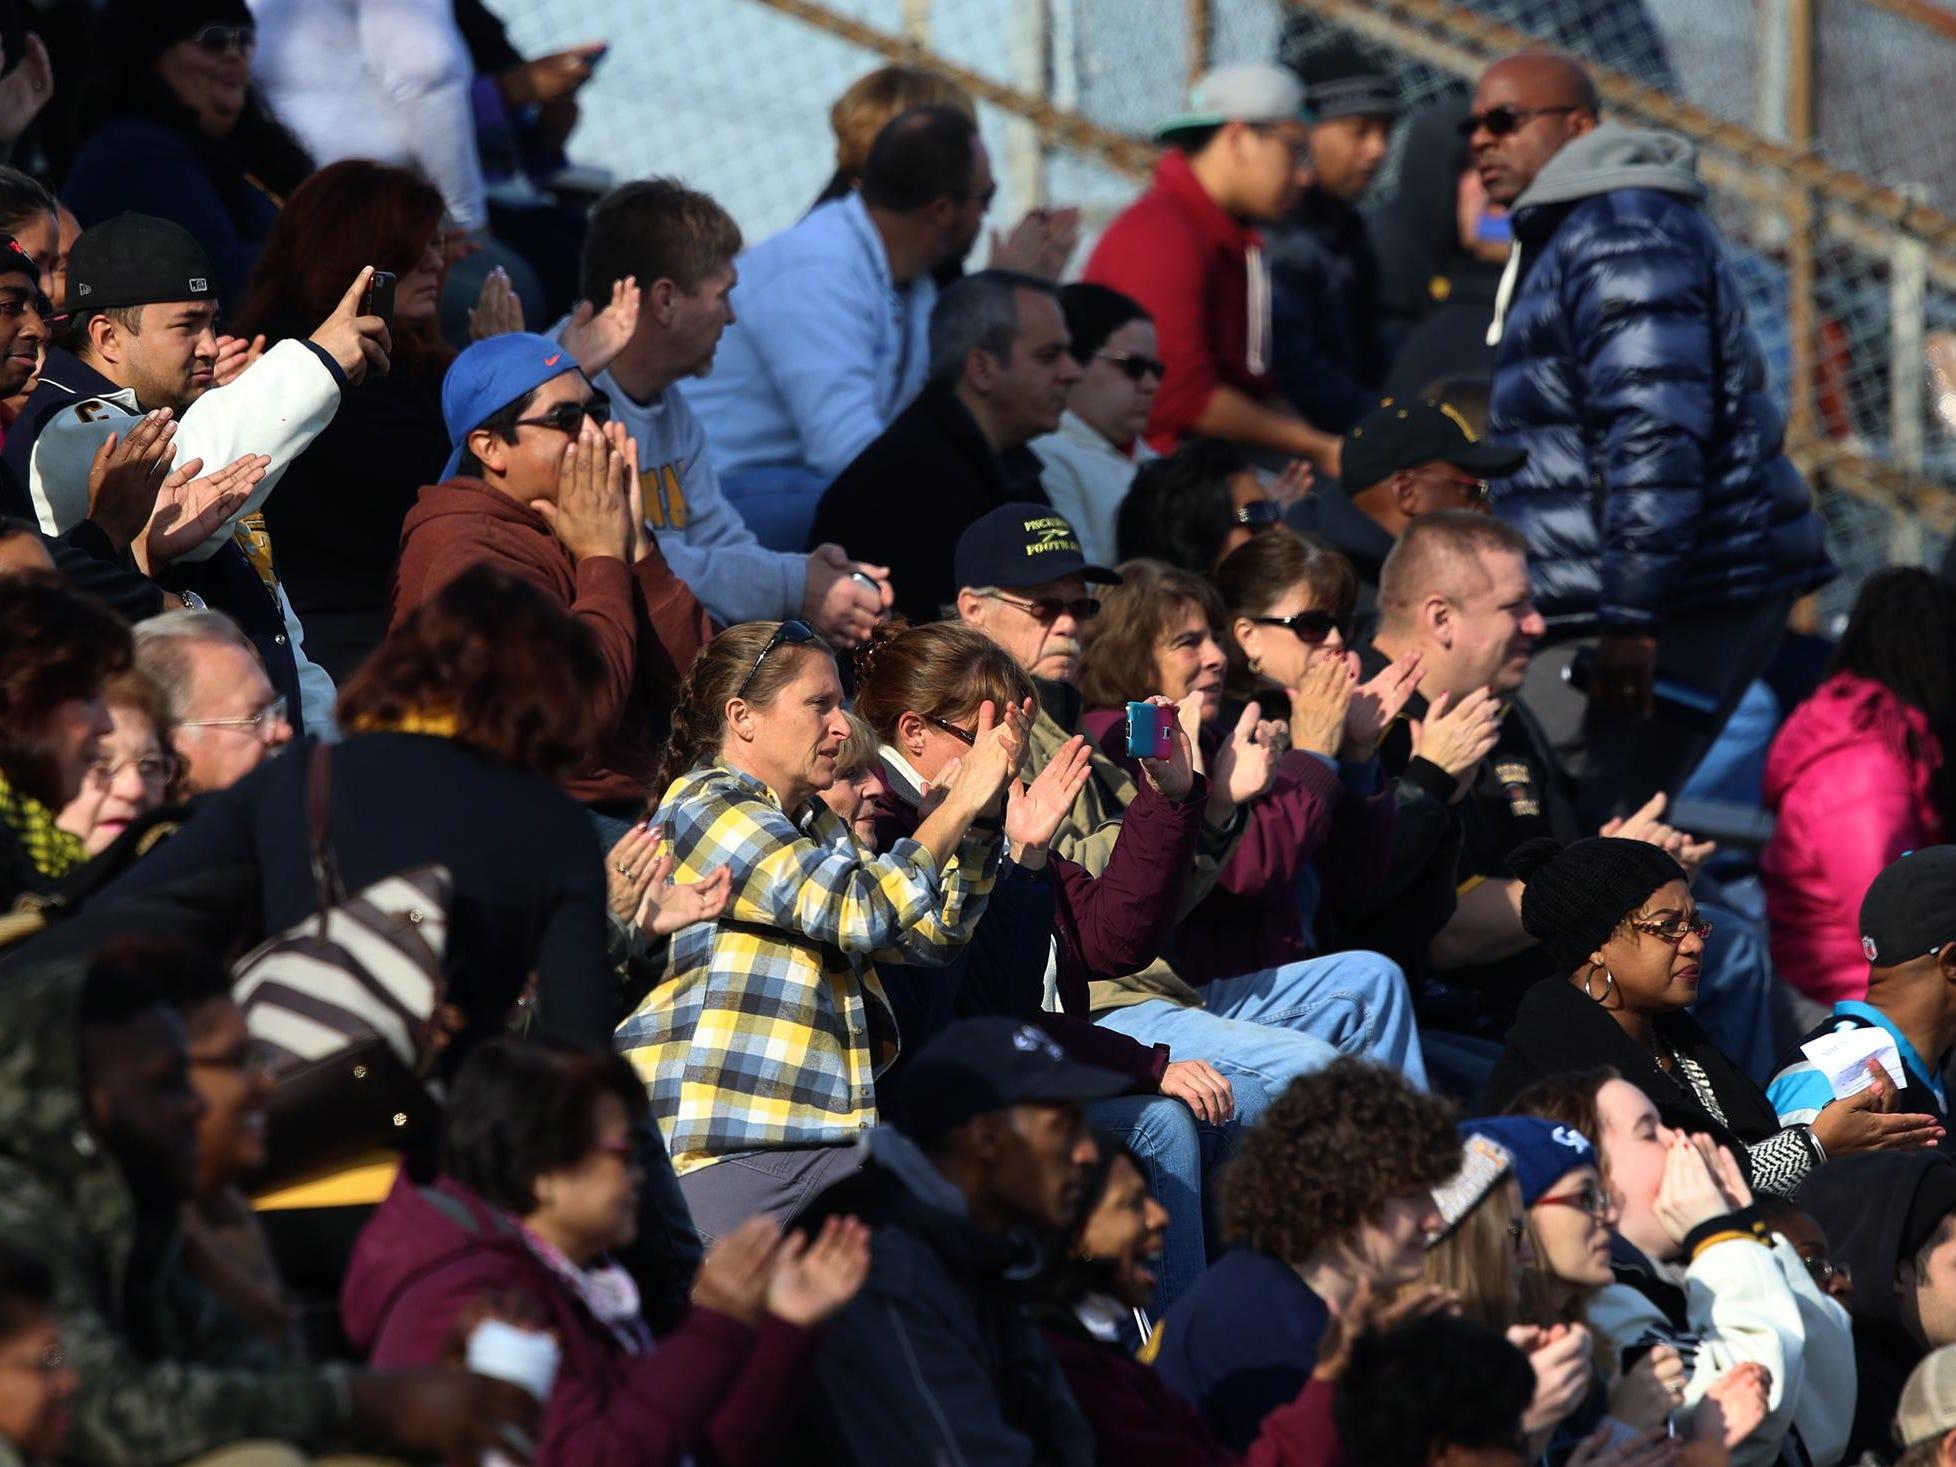 Franklin high school football vs Piscataway at Piscataway Thursday November 26, 2015 photo by Ed Pagliarini